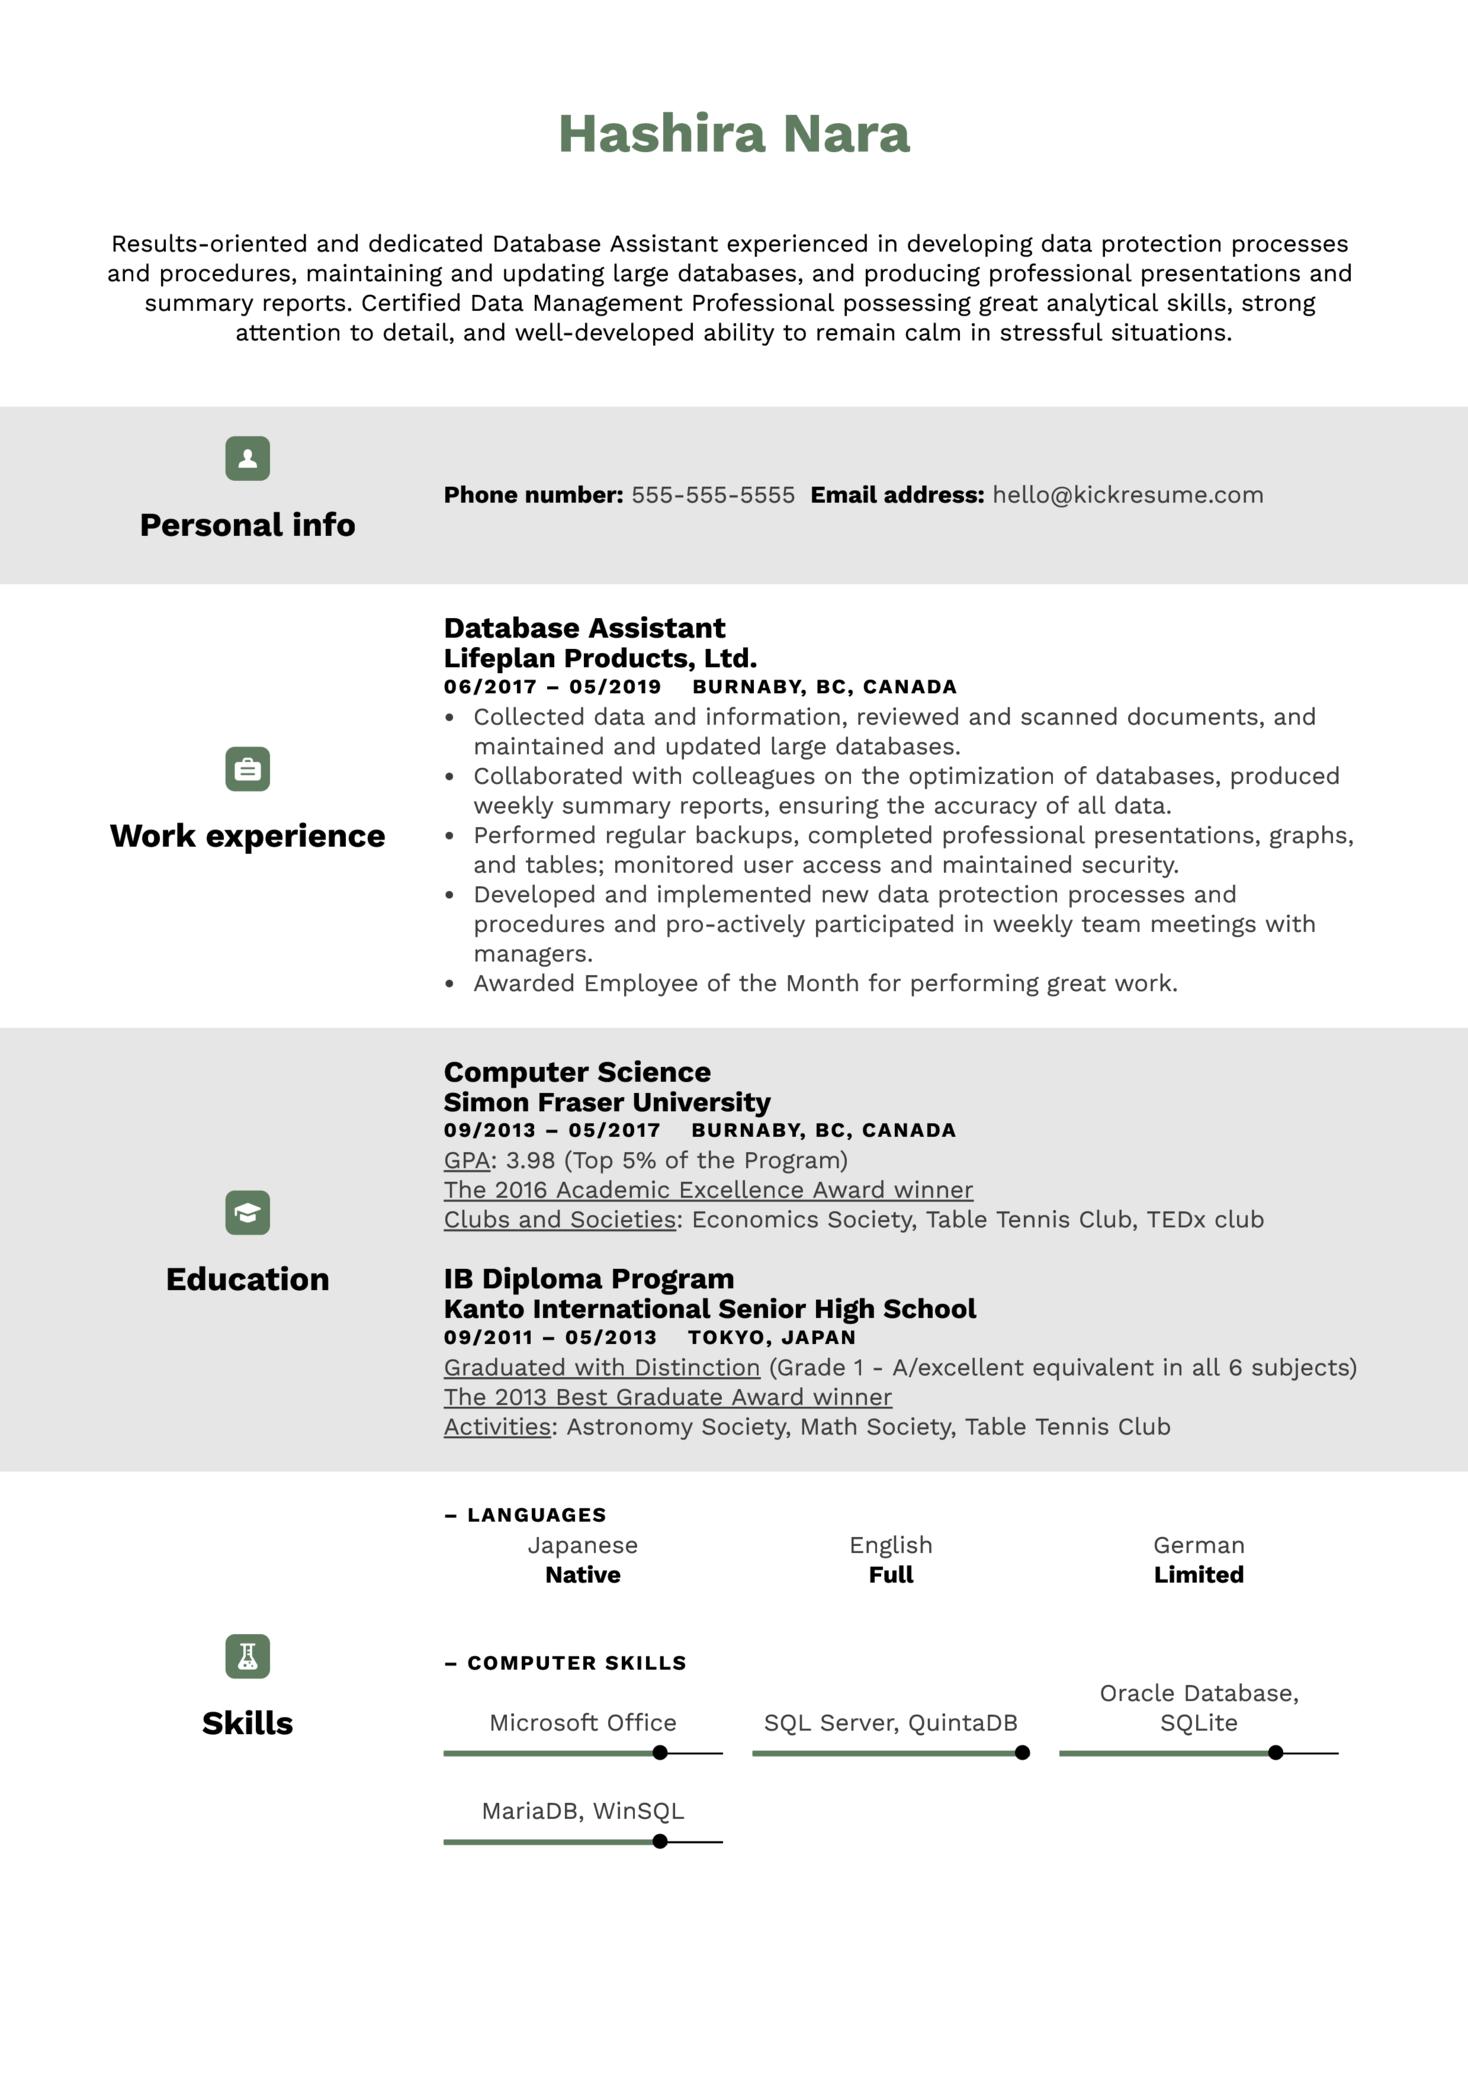 Database Assistant Resume Sample (parte 1)